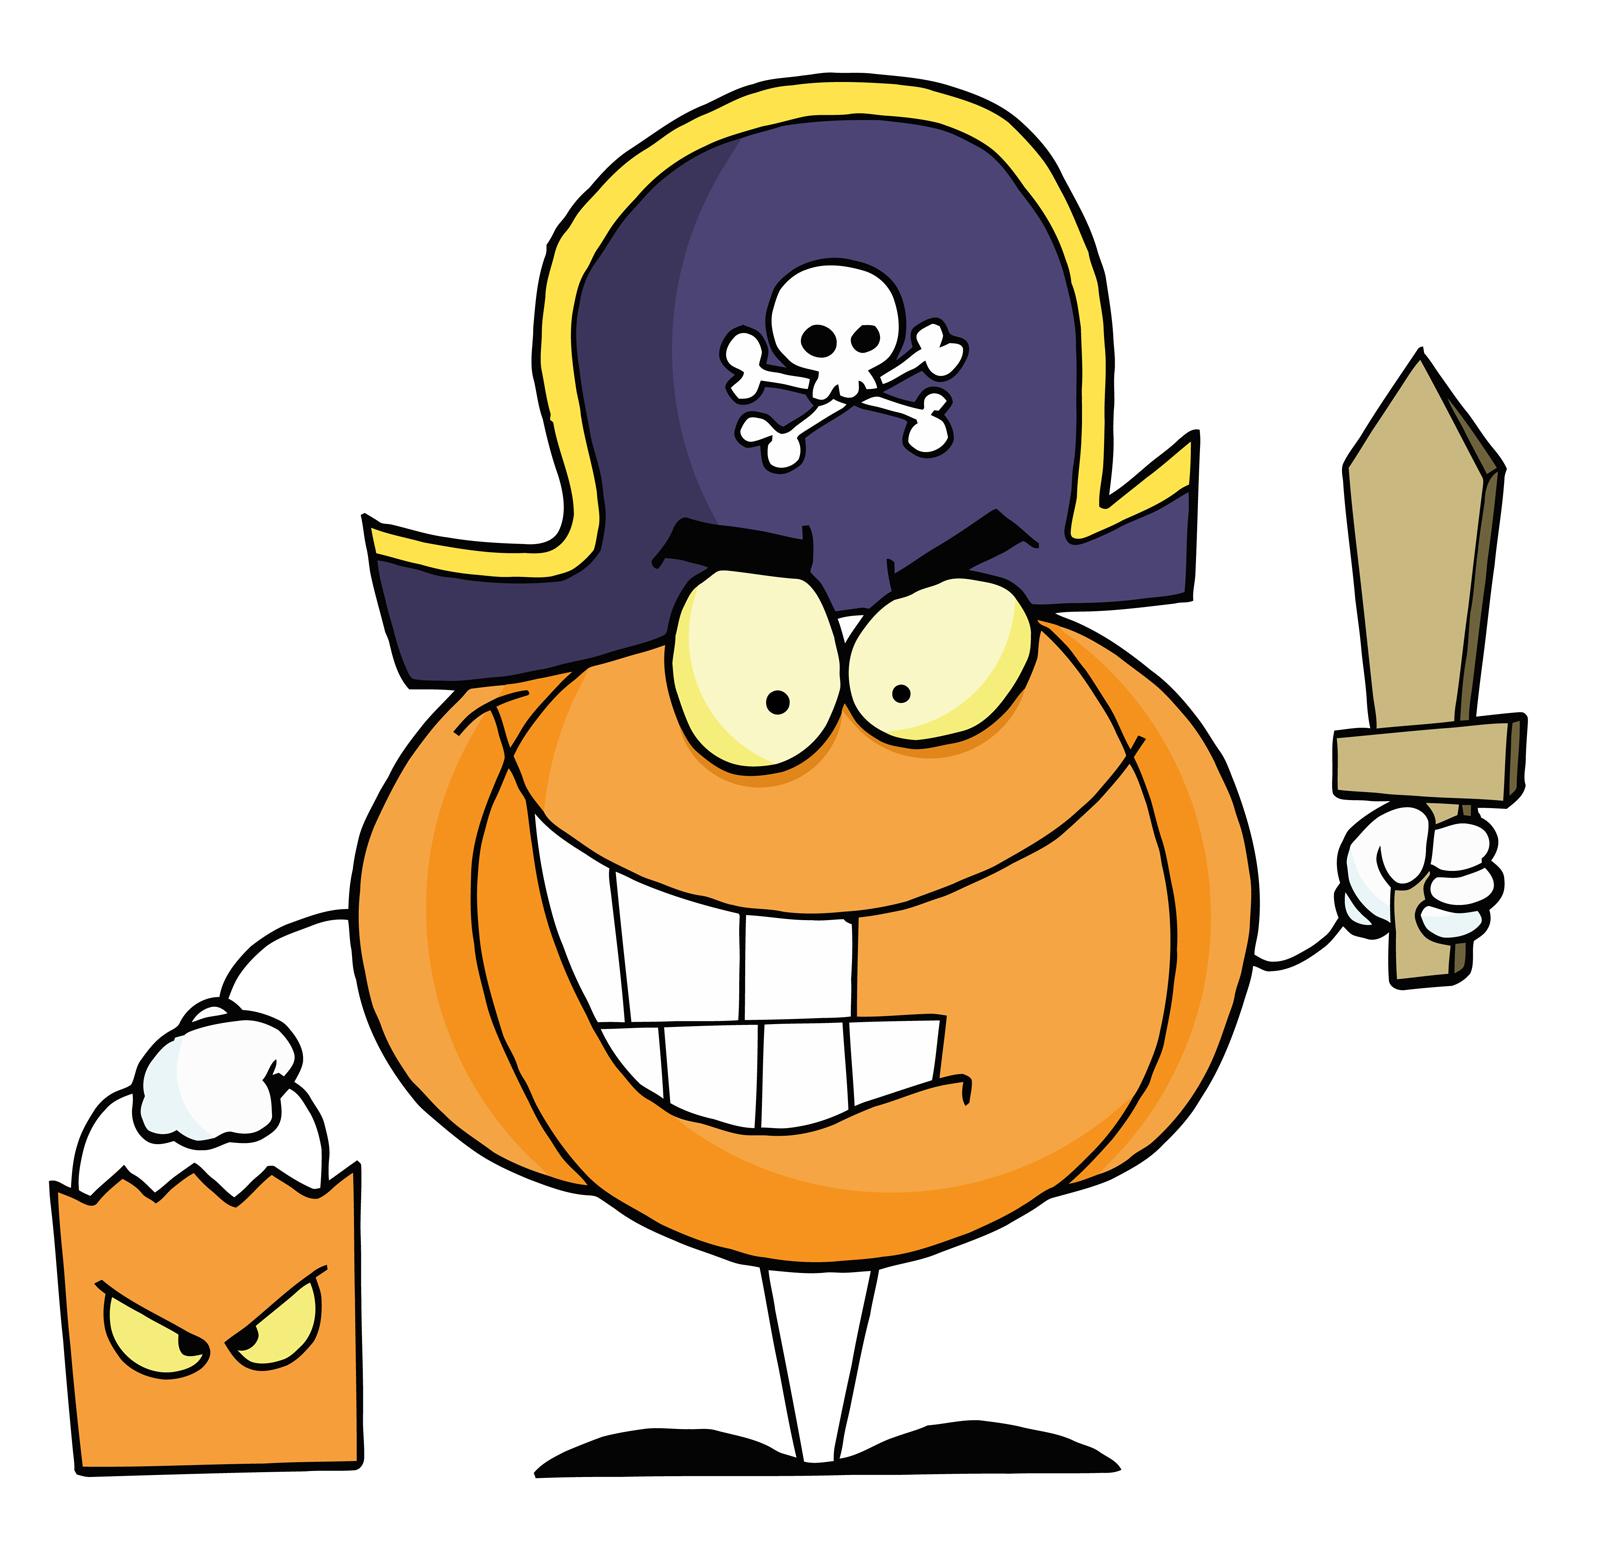 Character pumpkin clipart vector free stock Pirate Pumpkin Clipart - Clipart Kid vector free stock